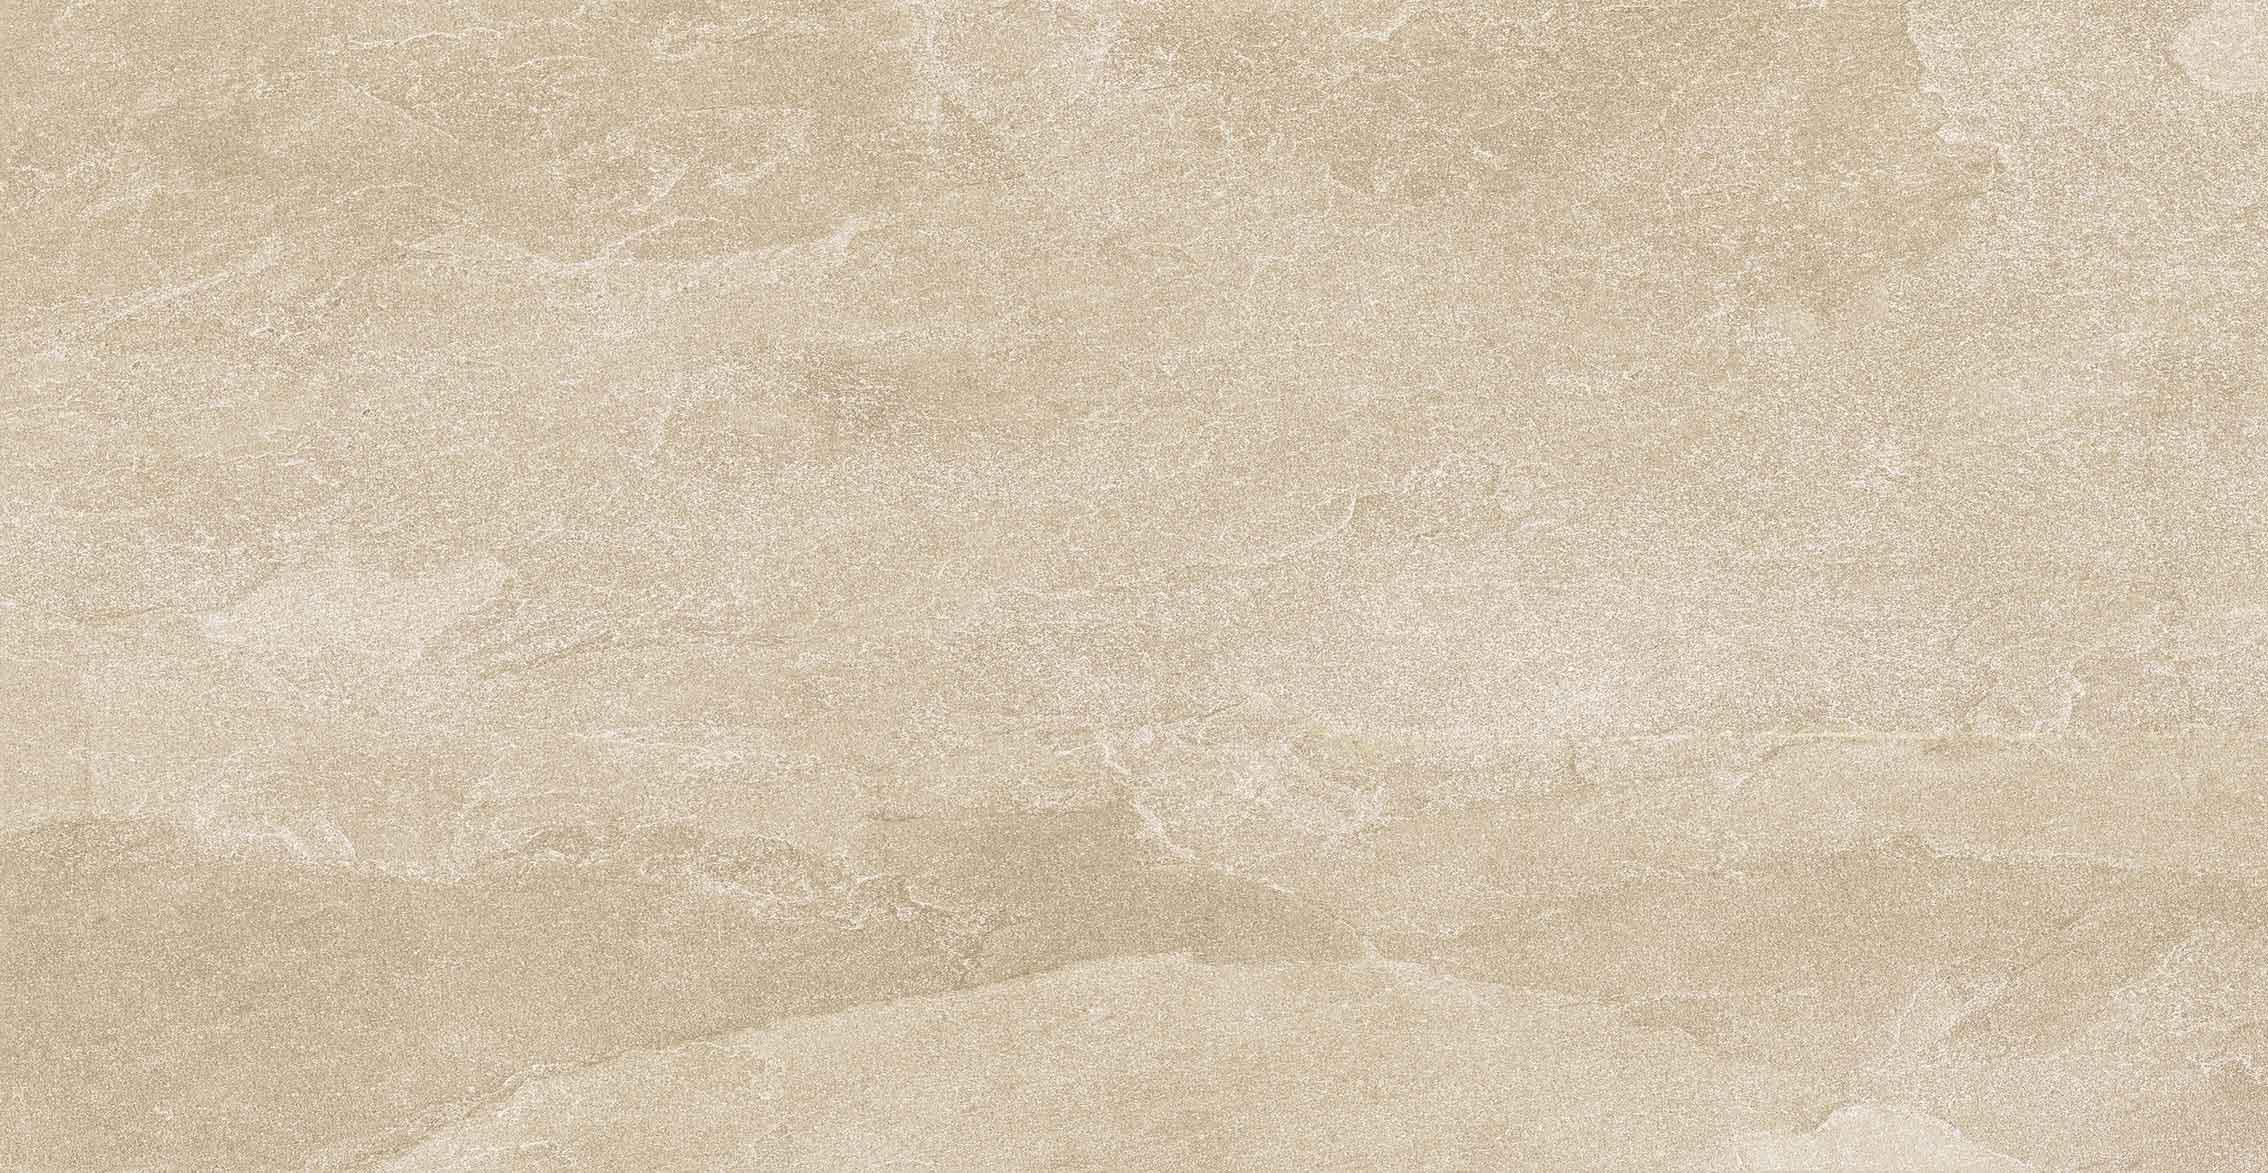 Natural Stone Cream Matte 10mm 30 x 60